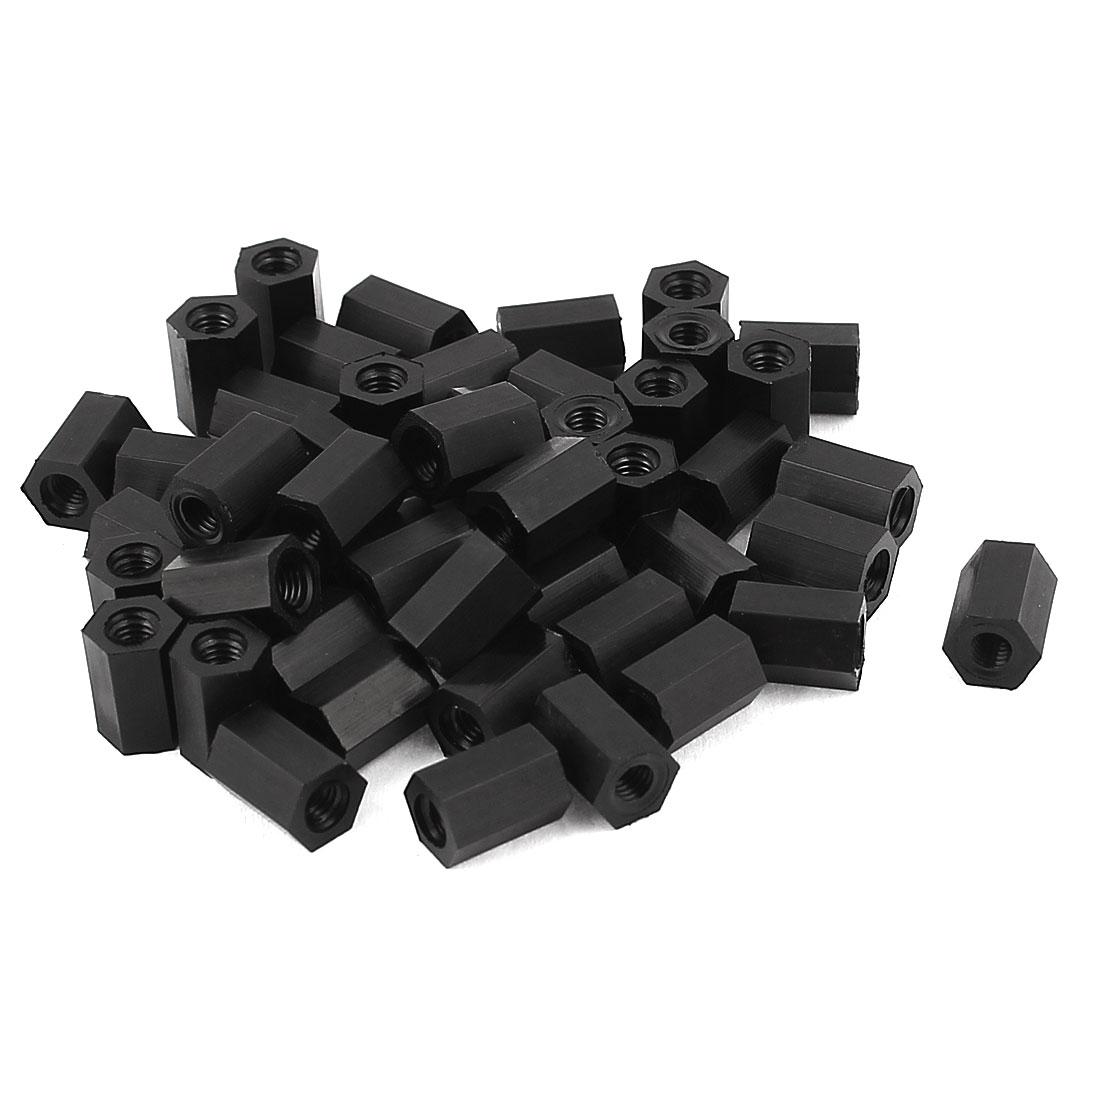 M3x8mm Female Thread Nylon Hex Standoff Spacer PCB Pillar Nut Black 50pcs